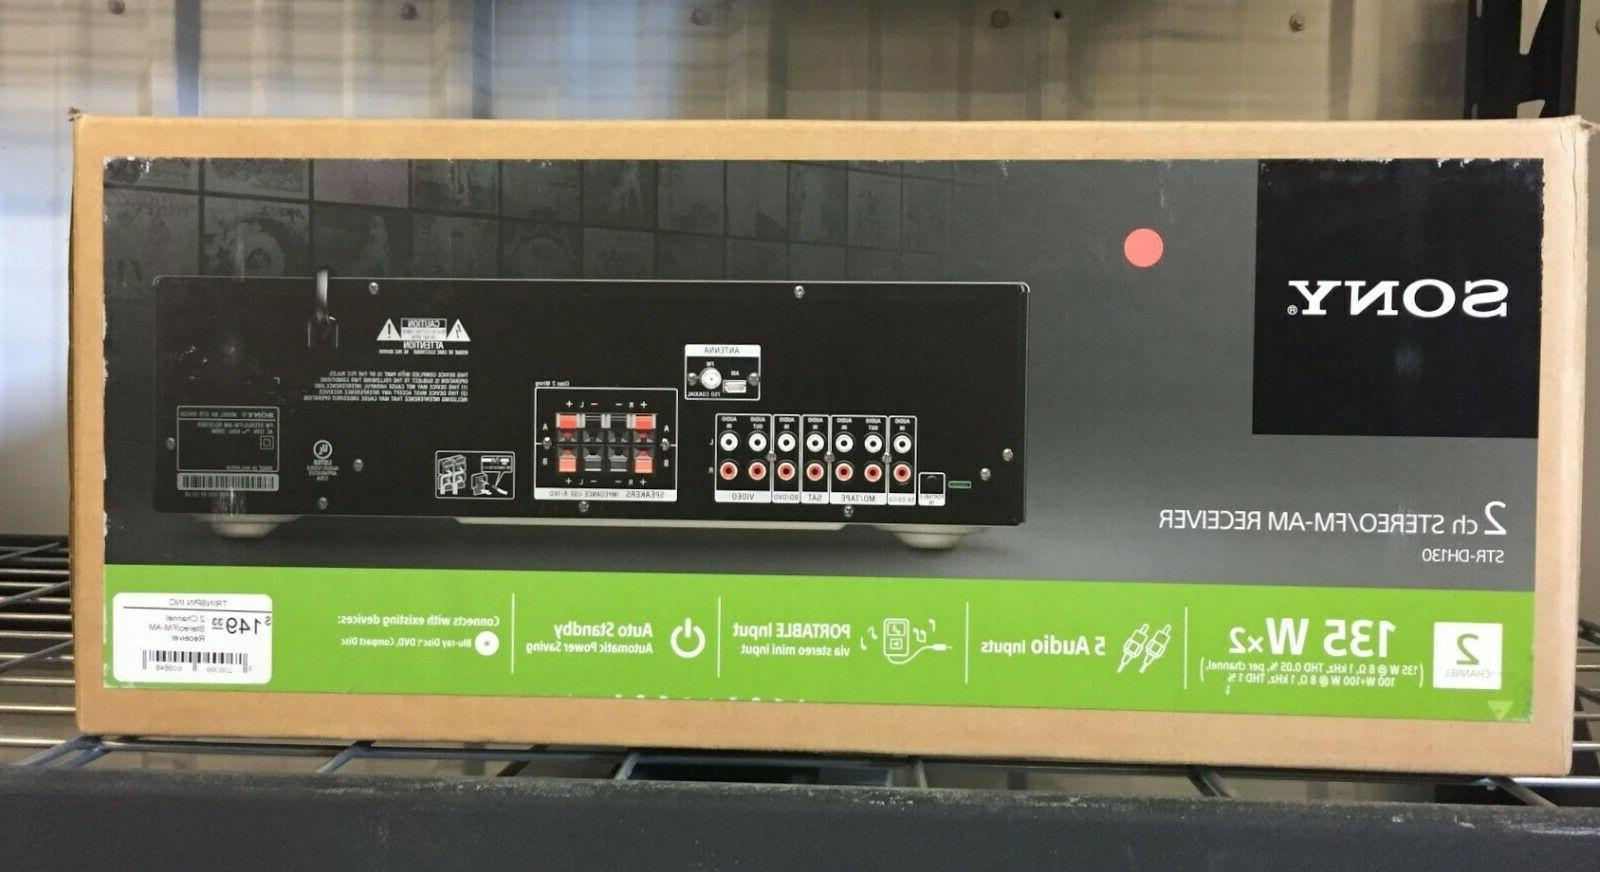 Sony STR STR-DH130 Channel 100 Receiver **Brand New**